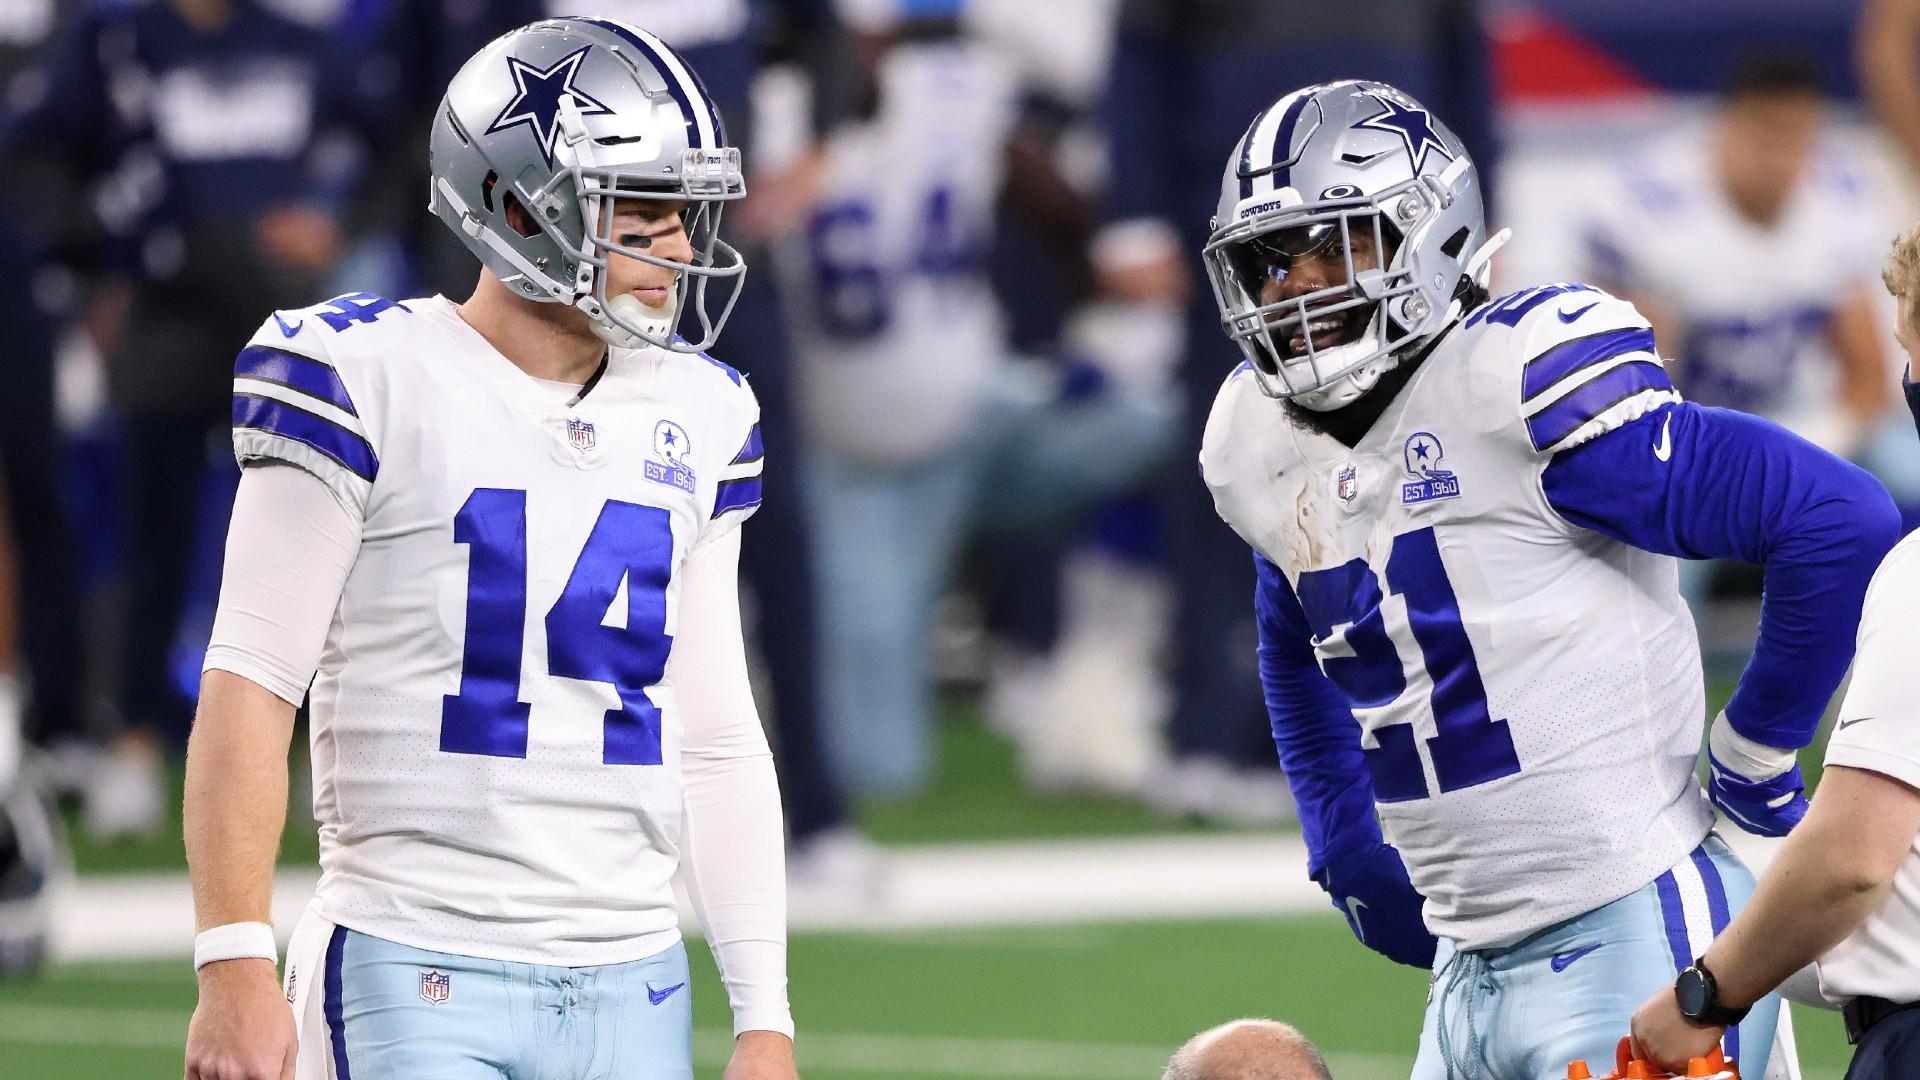 Dak Prescott's value to Cowboys will keep rising with every epic fail by Andy Dalton, Ezekiel Elliott 1